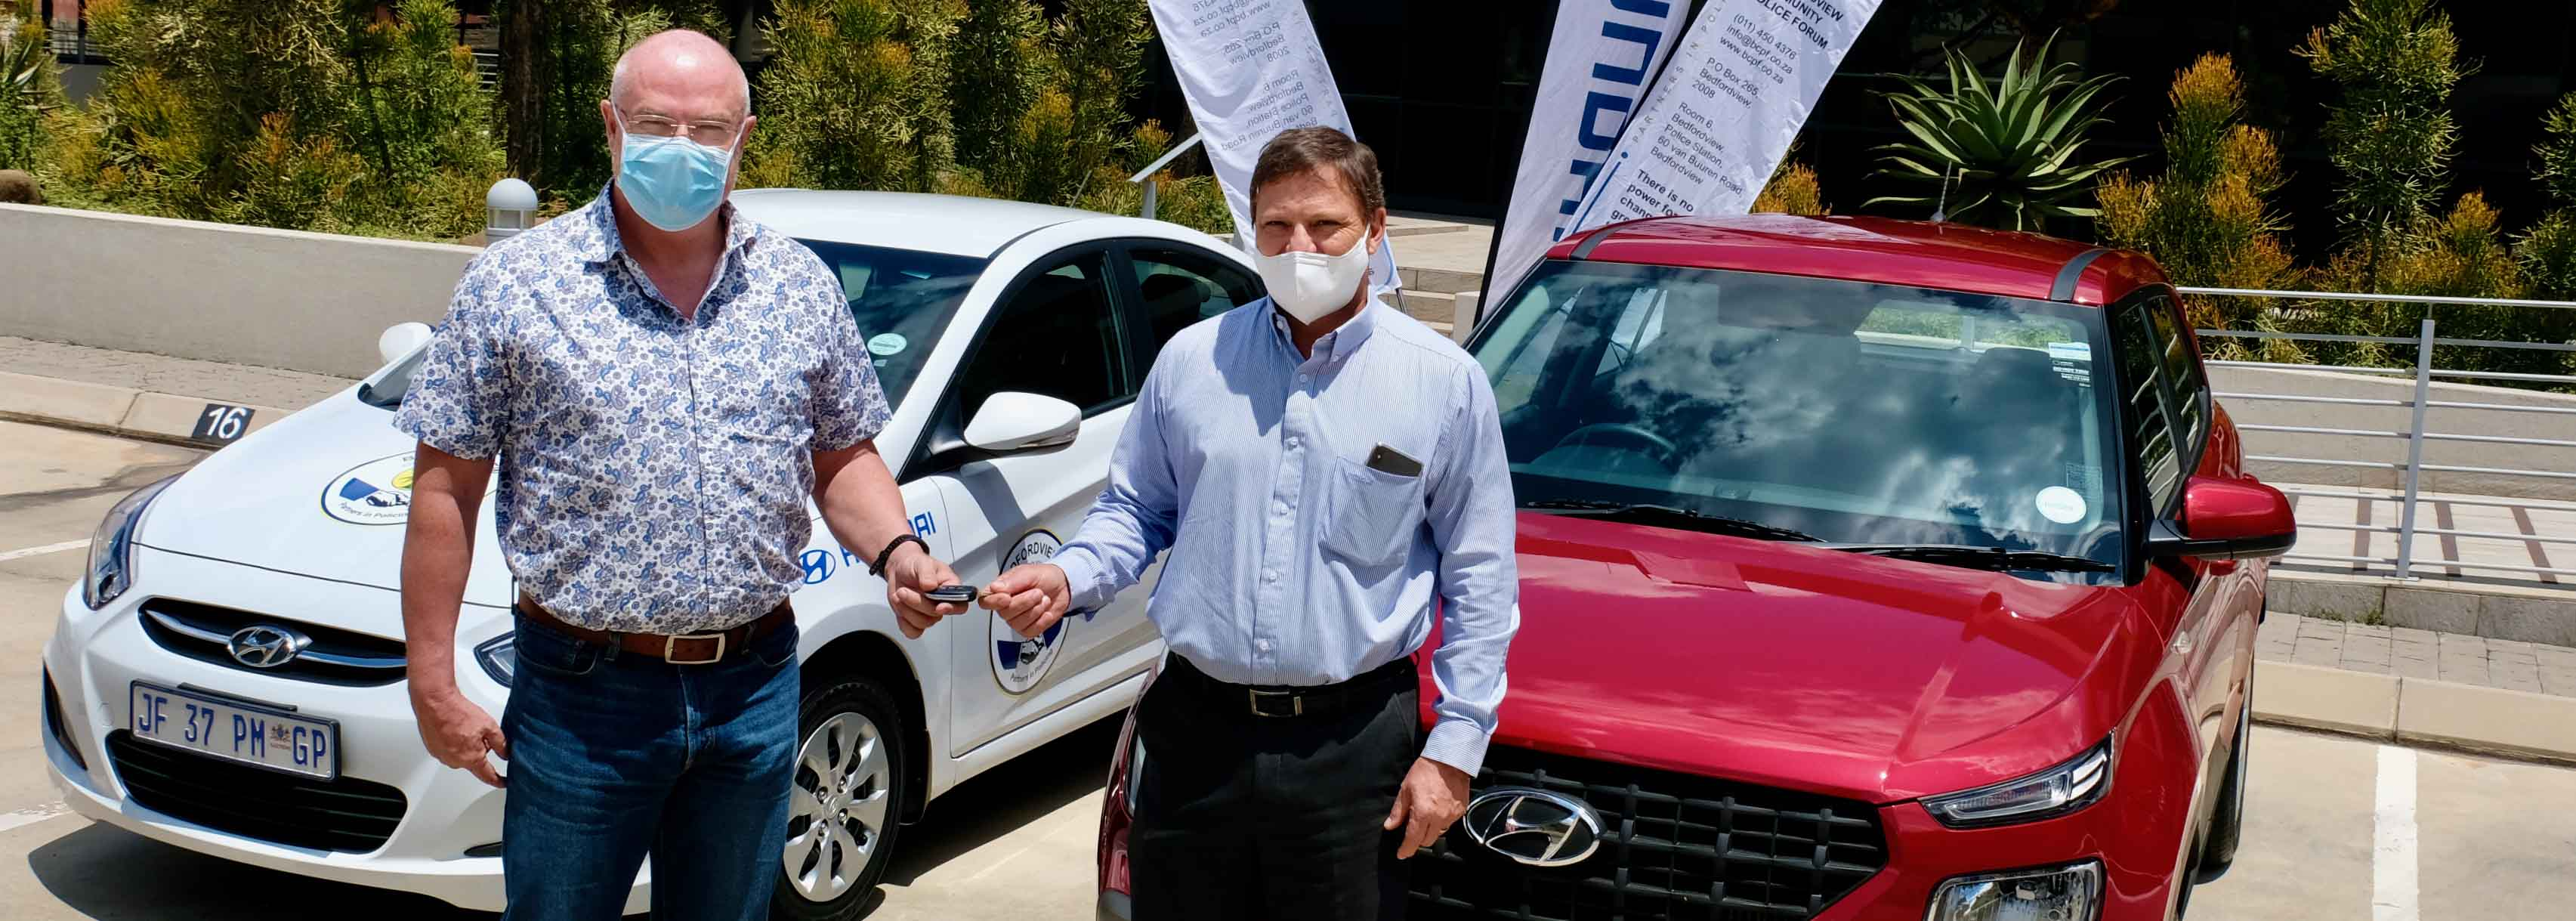 Hyundai donates vehicles